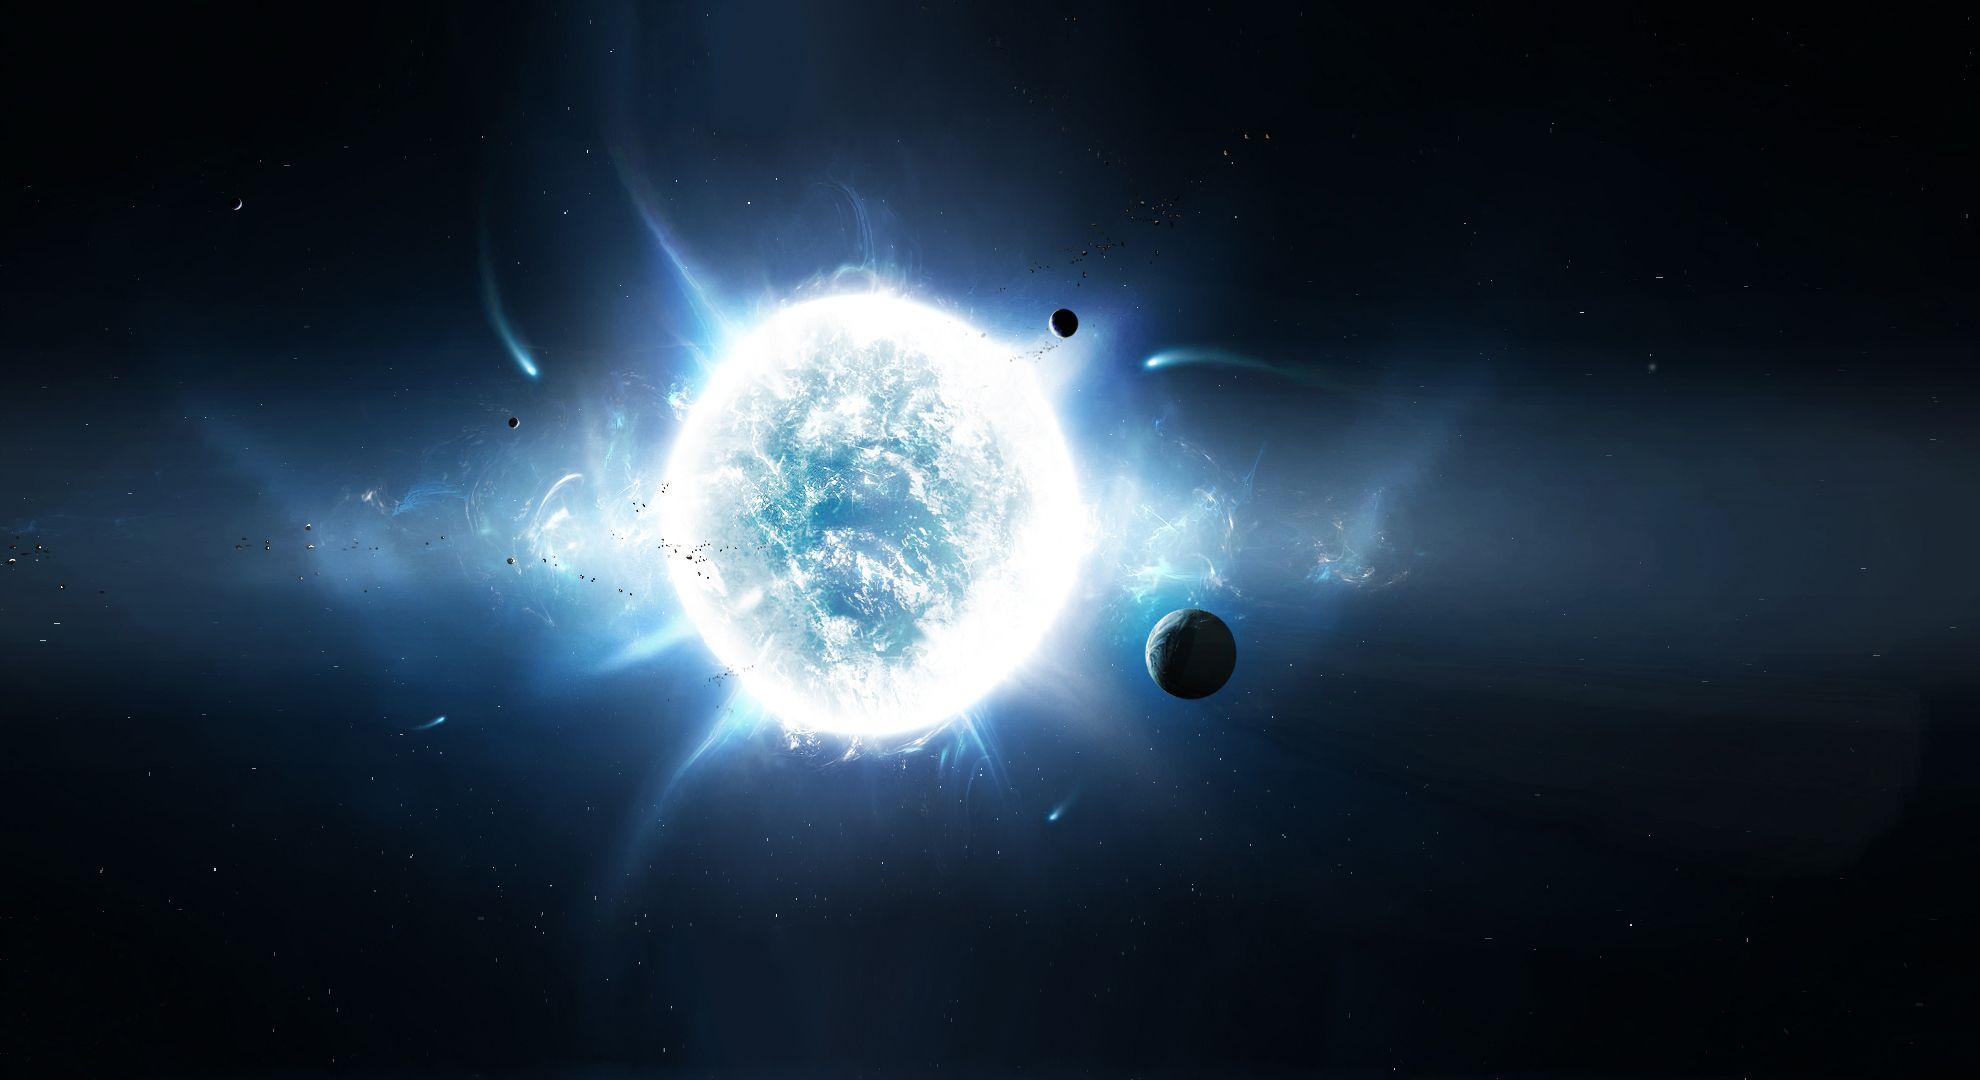 Neutron Star Wallpaper 1980x1080 Id 33931 Neutron Star Binary Star Sirius B